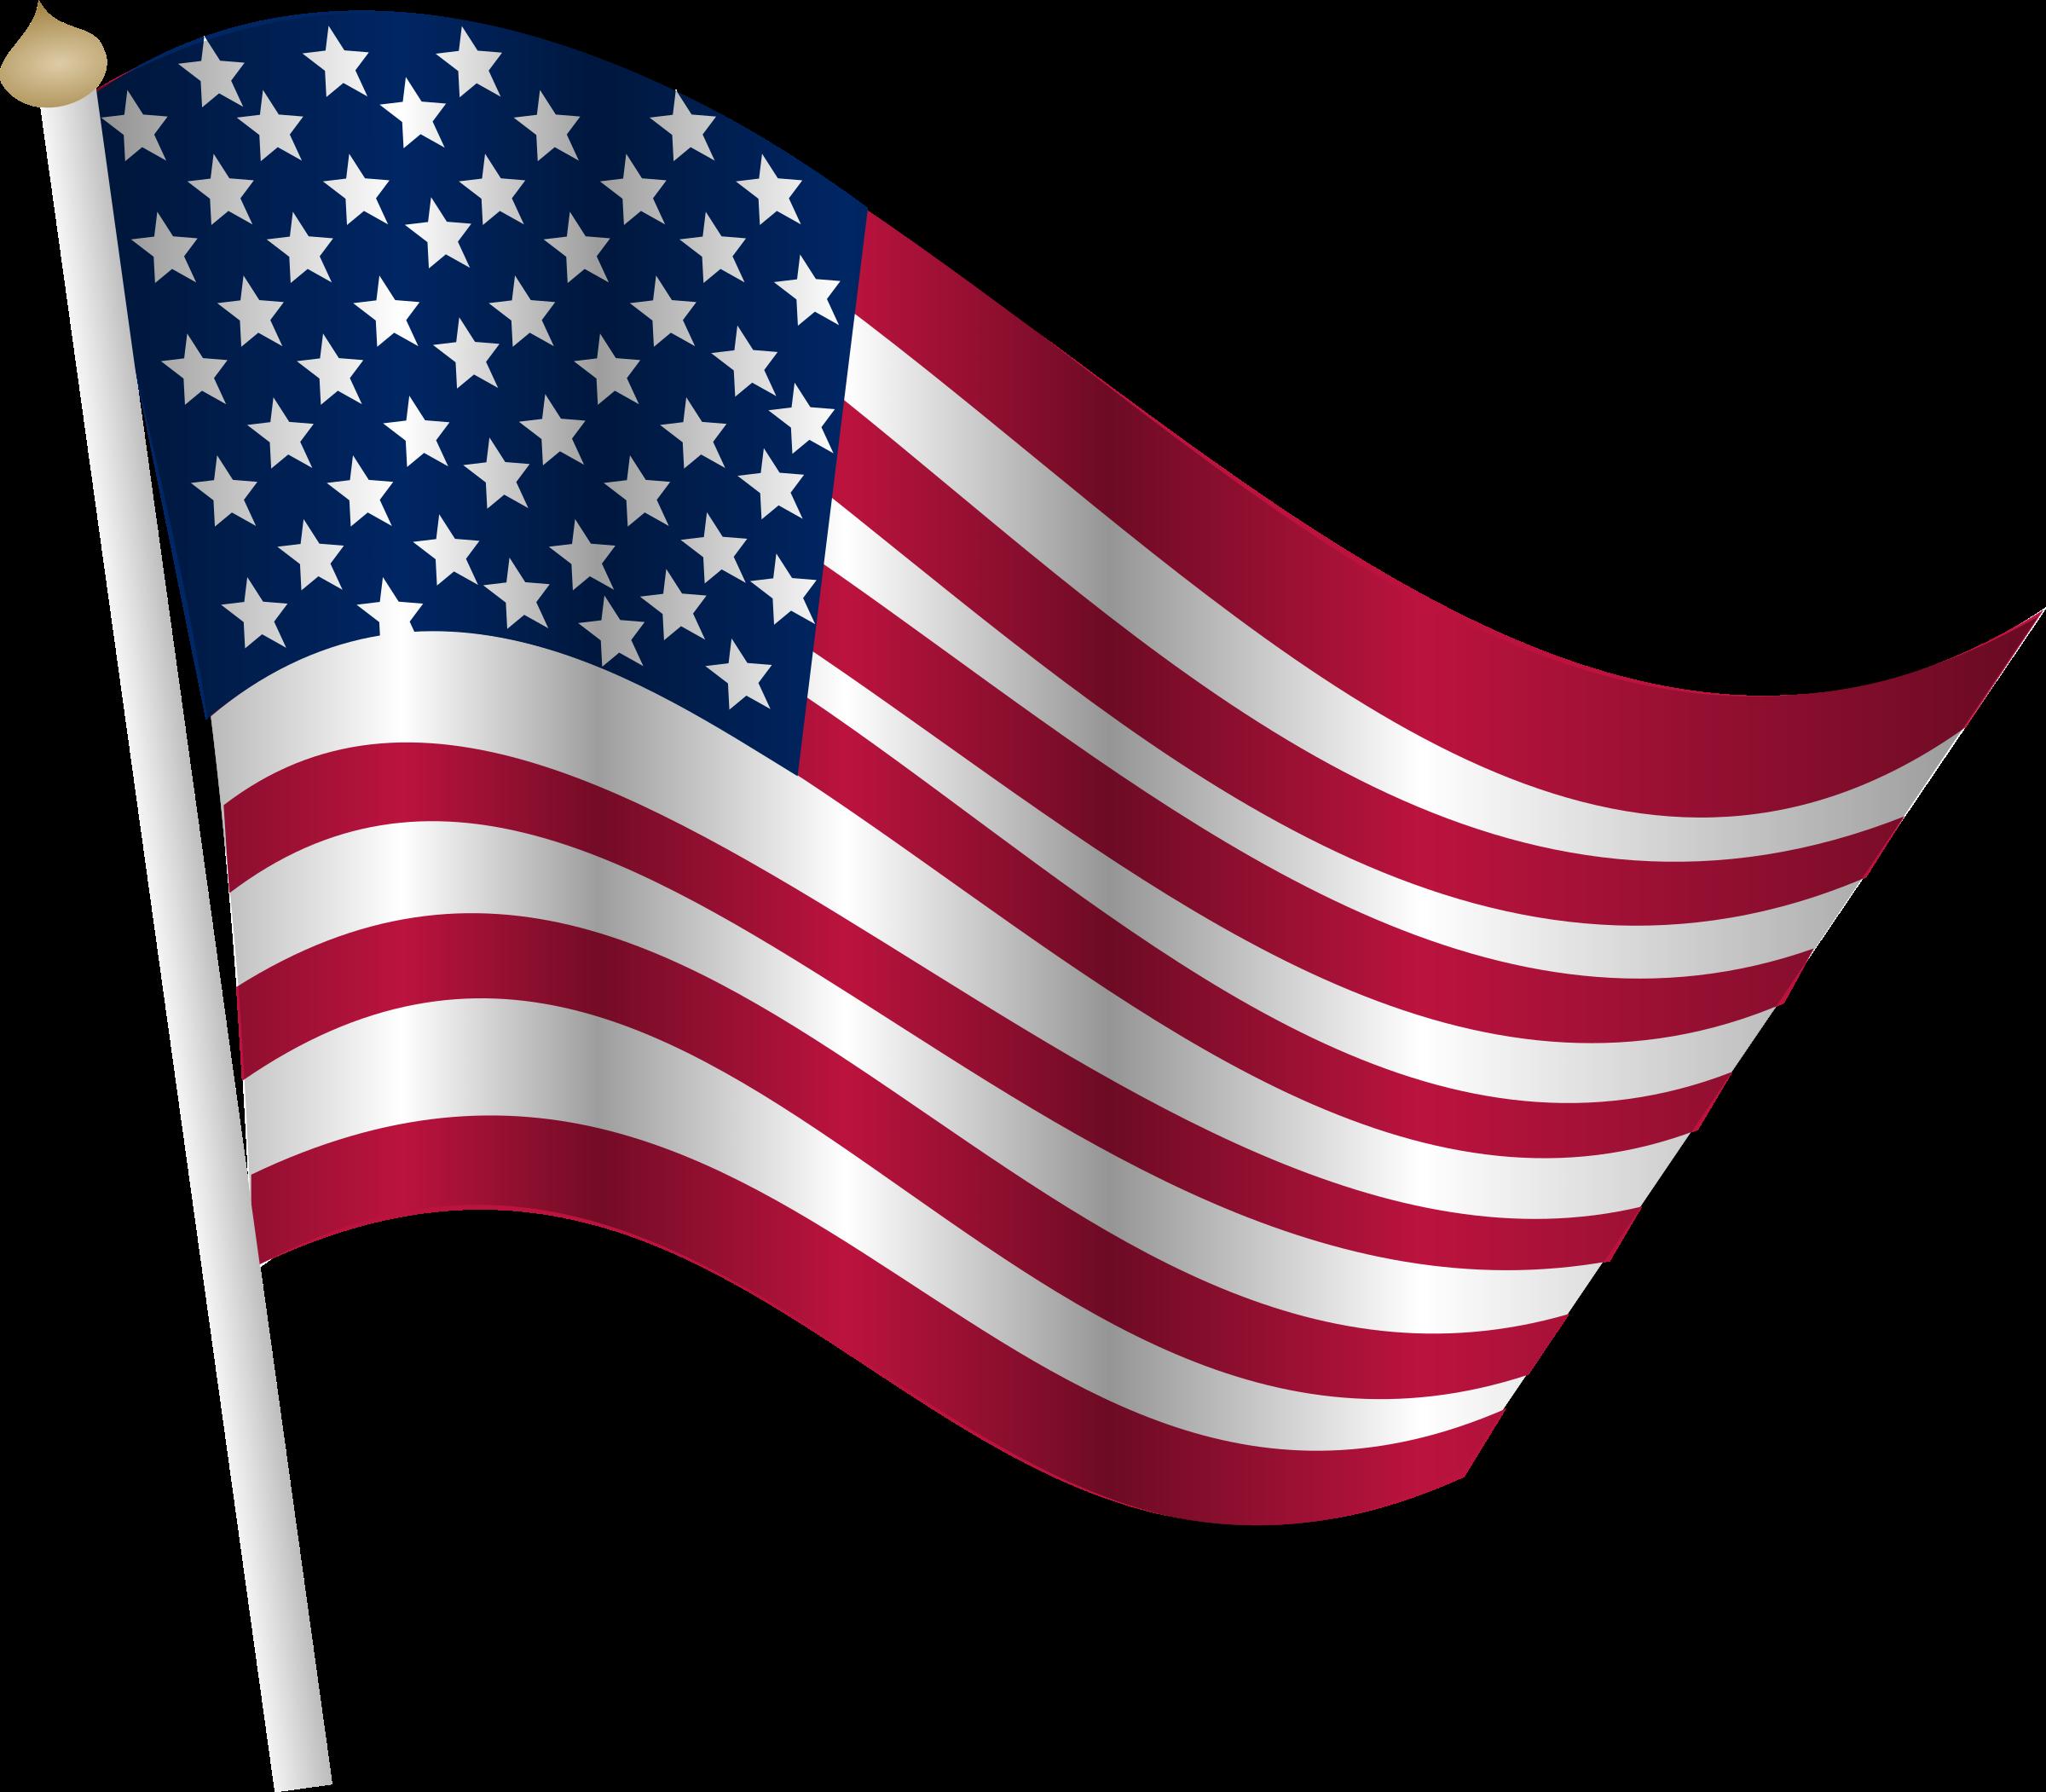 Cartoon American Flag Clipart American Flag Png In 2020 American Flag Pictures American Flag Images American Flag Clip Art